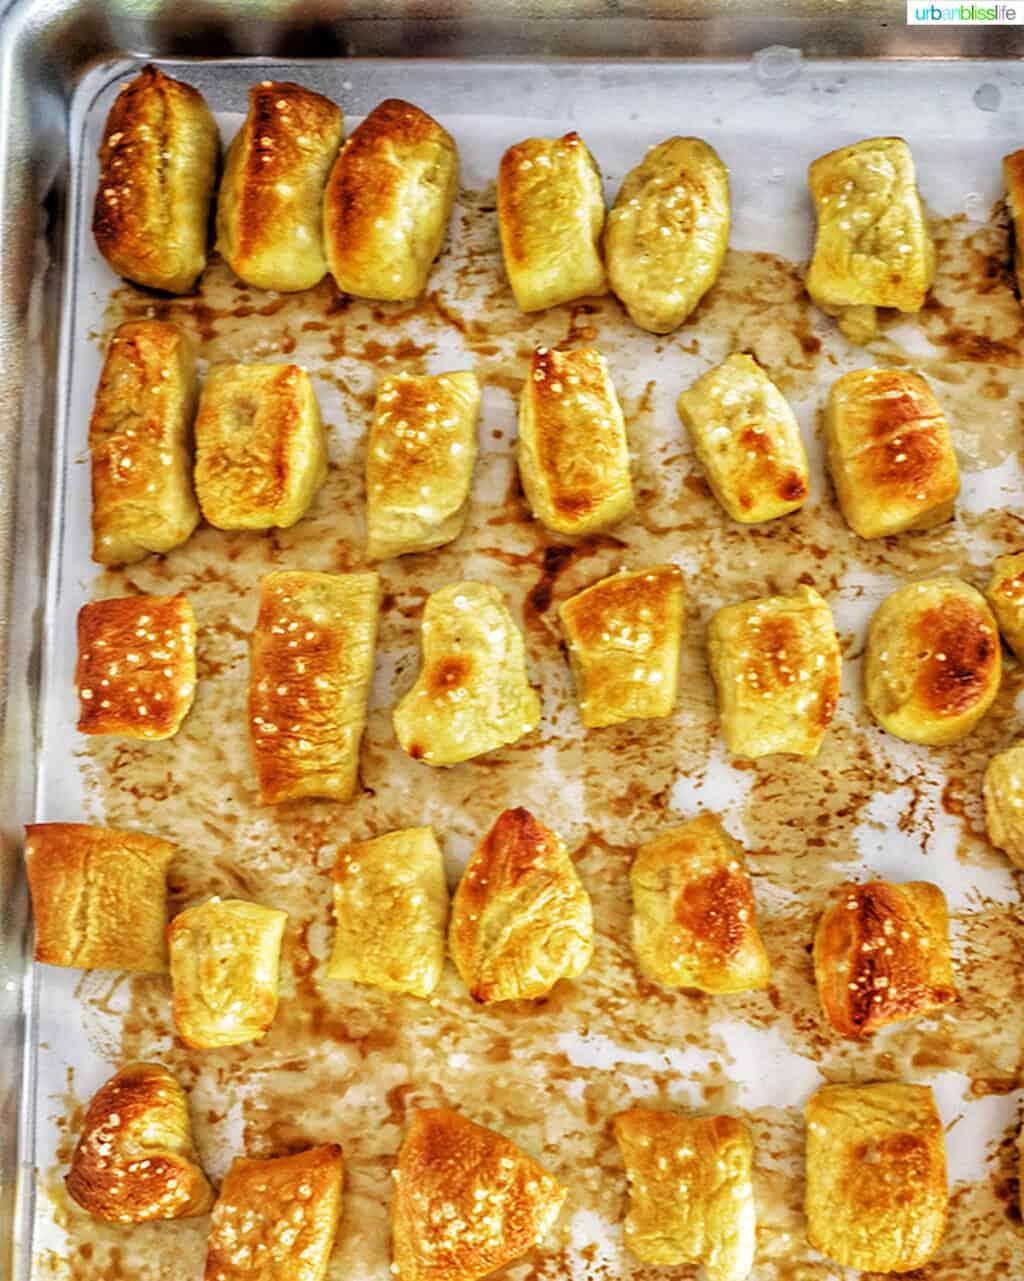 soft pretzel bites on baking sheet